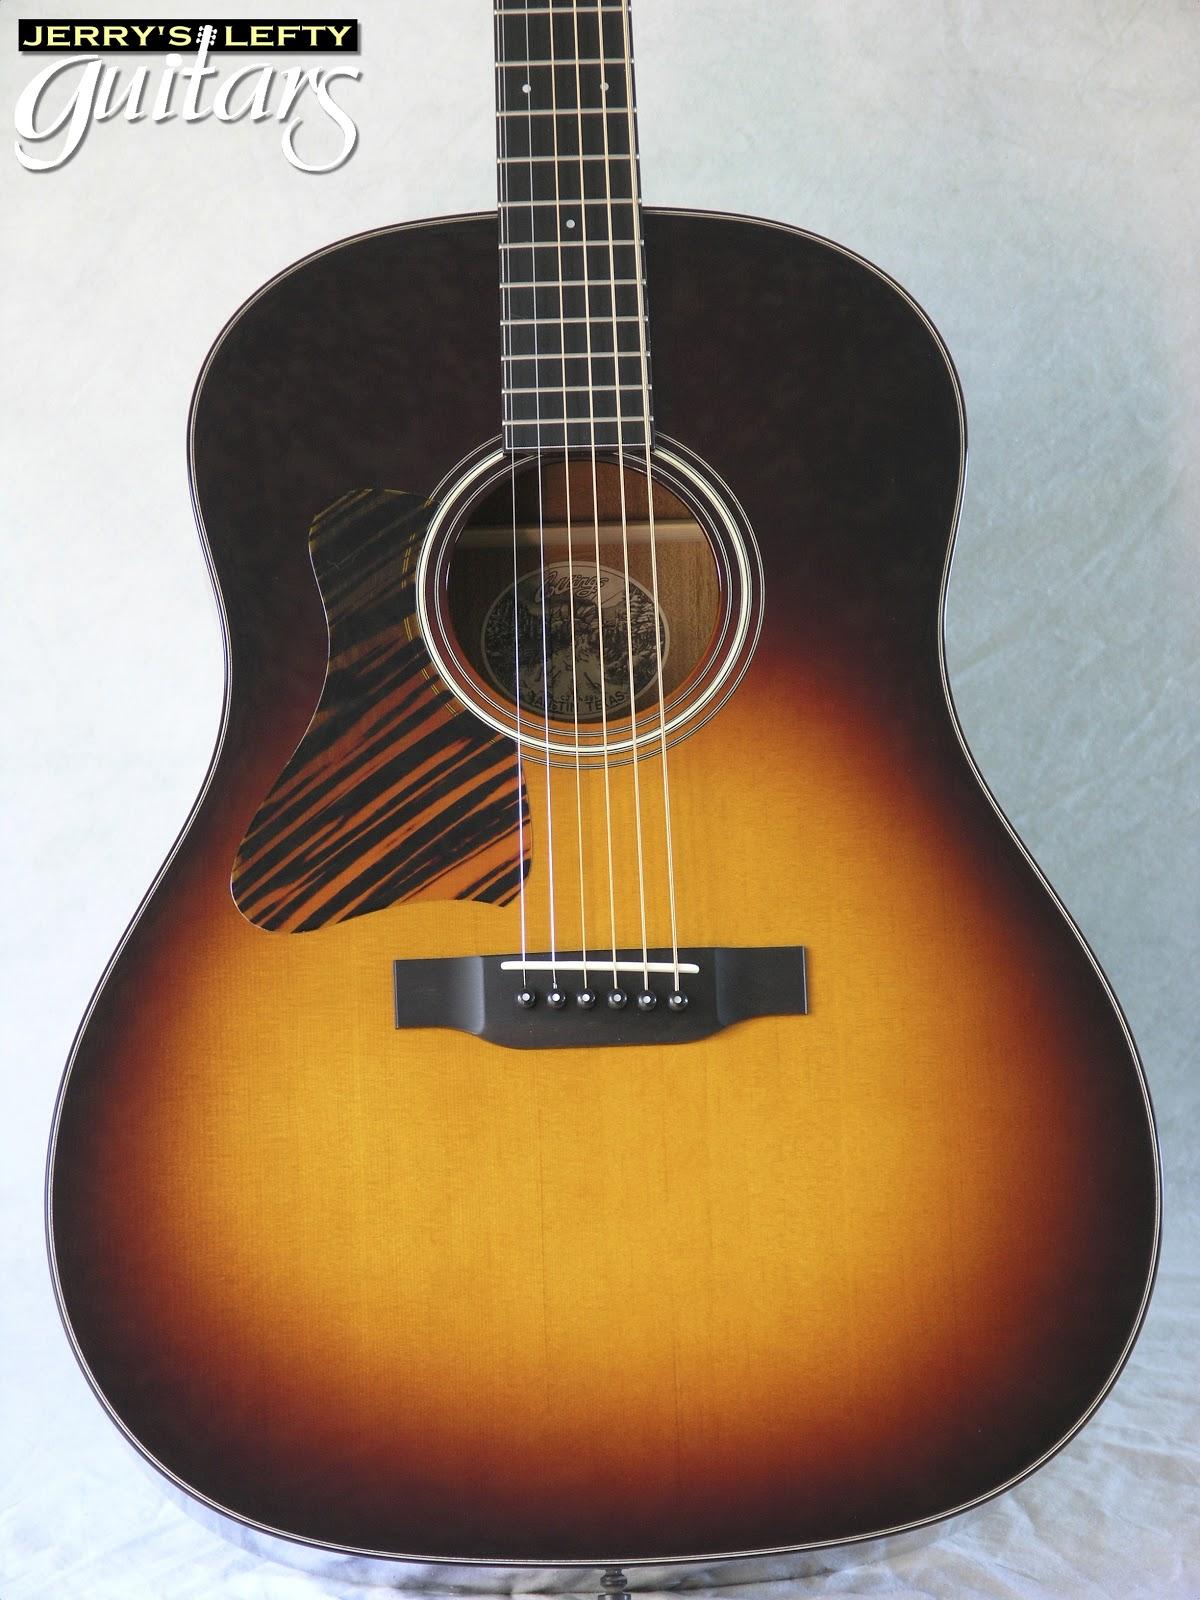 jerry 39 s lefty guitars newest guitar arrivals updated weekly collings cj custom left handed. Black Bedroom Furniture Sets. Home Design Ideas